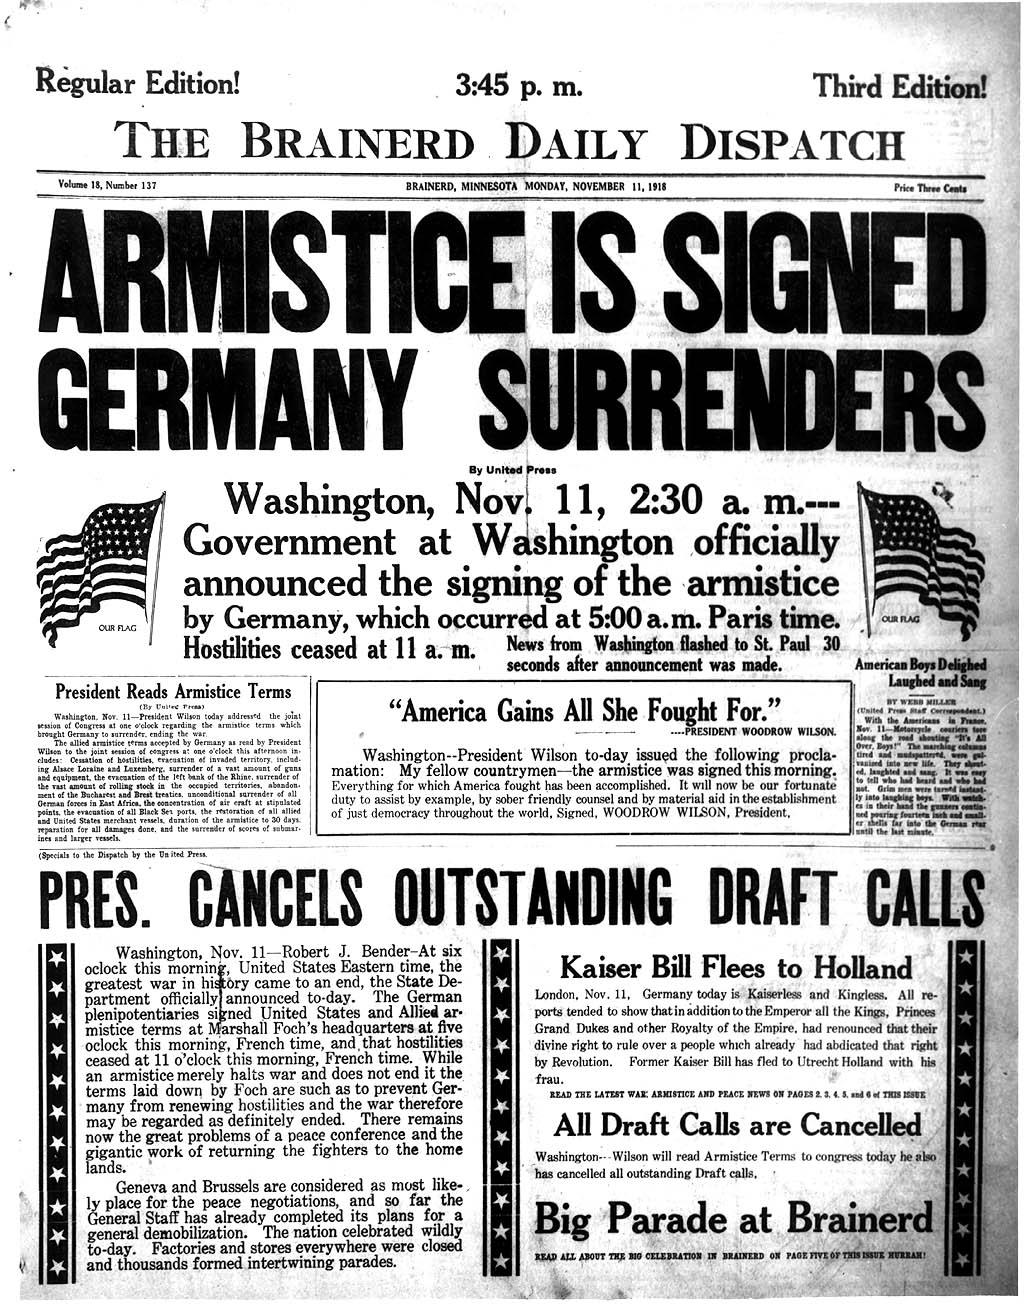 The Brainerd Daily Dispatch - Brainerd, Minnesota U.S.A. - November 11, 1918